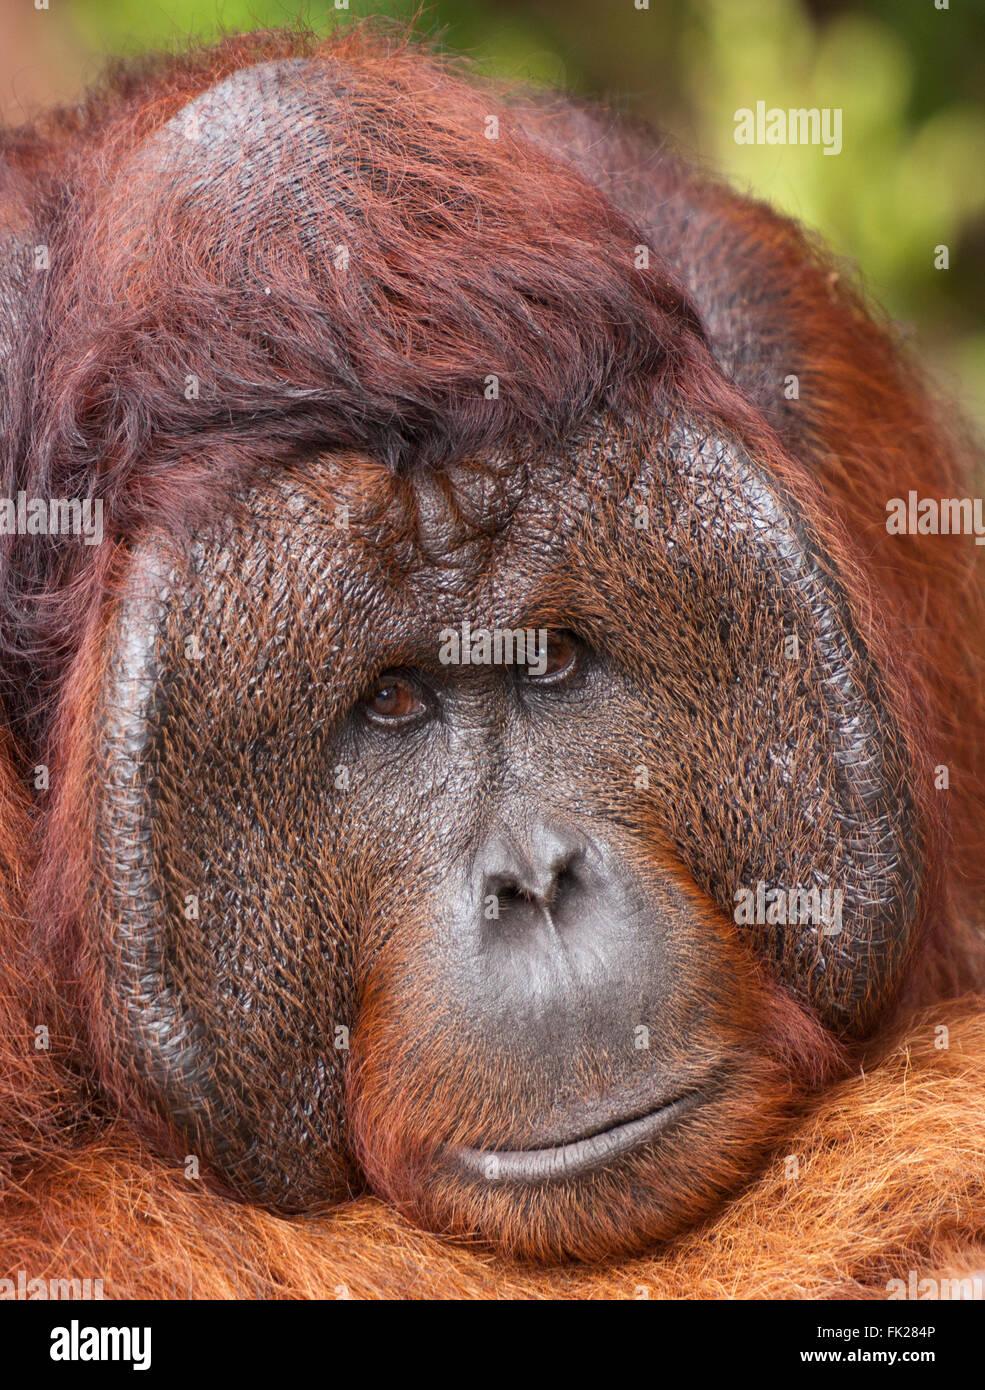 Bornean Orangutan (Pongo pygmaeus wurmbii) - Tom, king of the jungle of Camp Leakey. - Stock Image